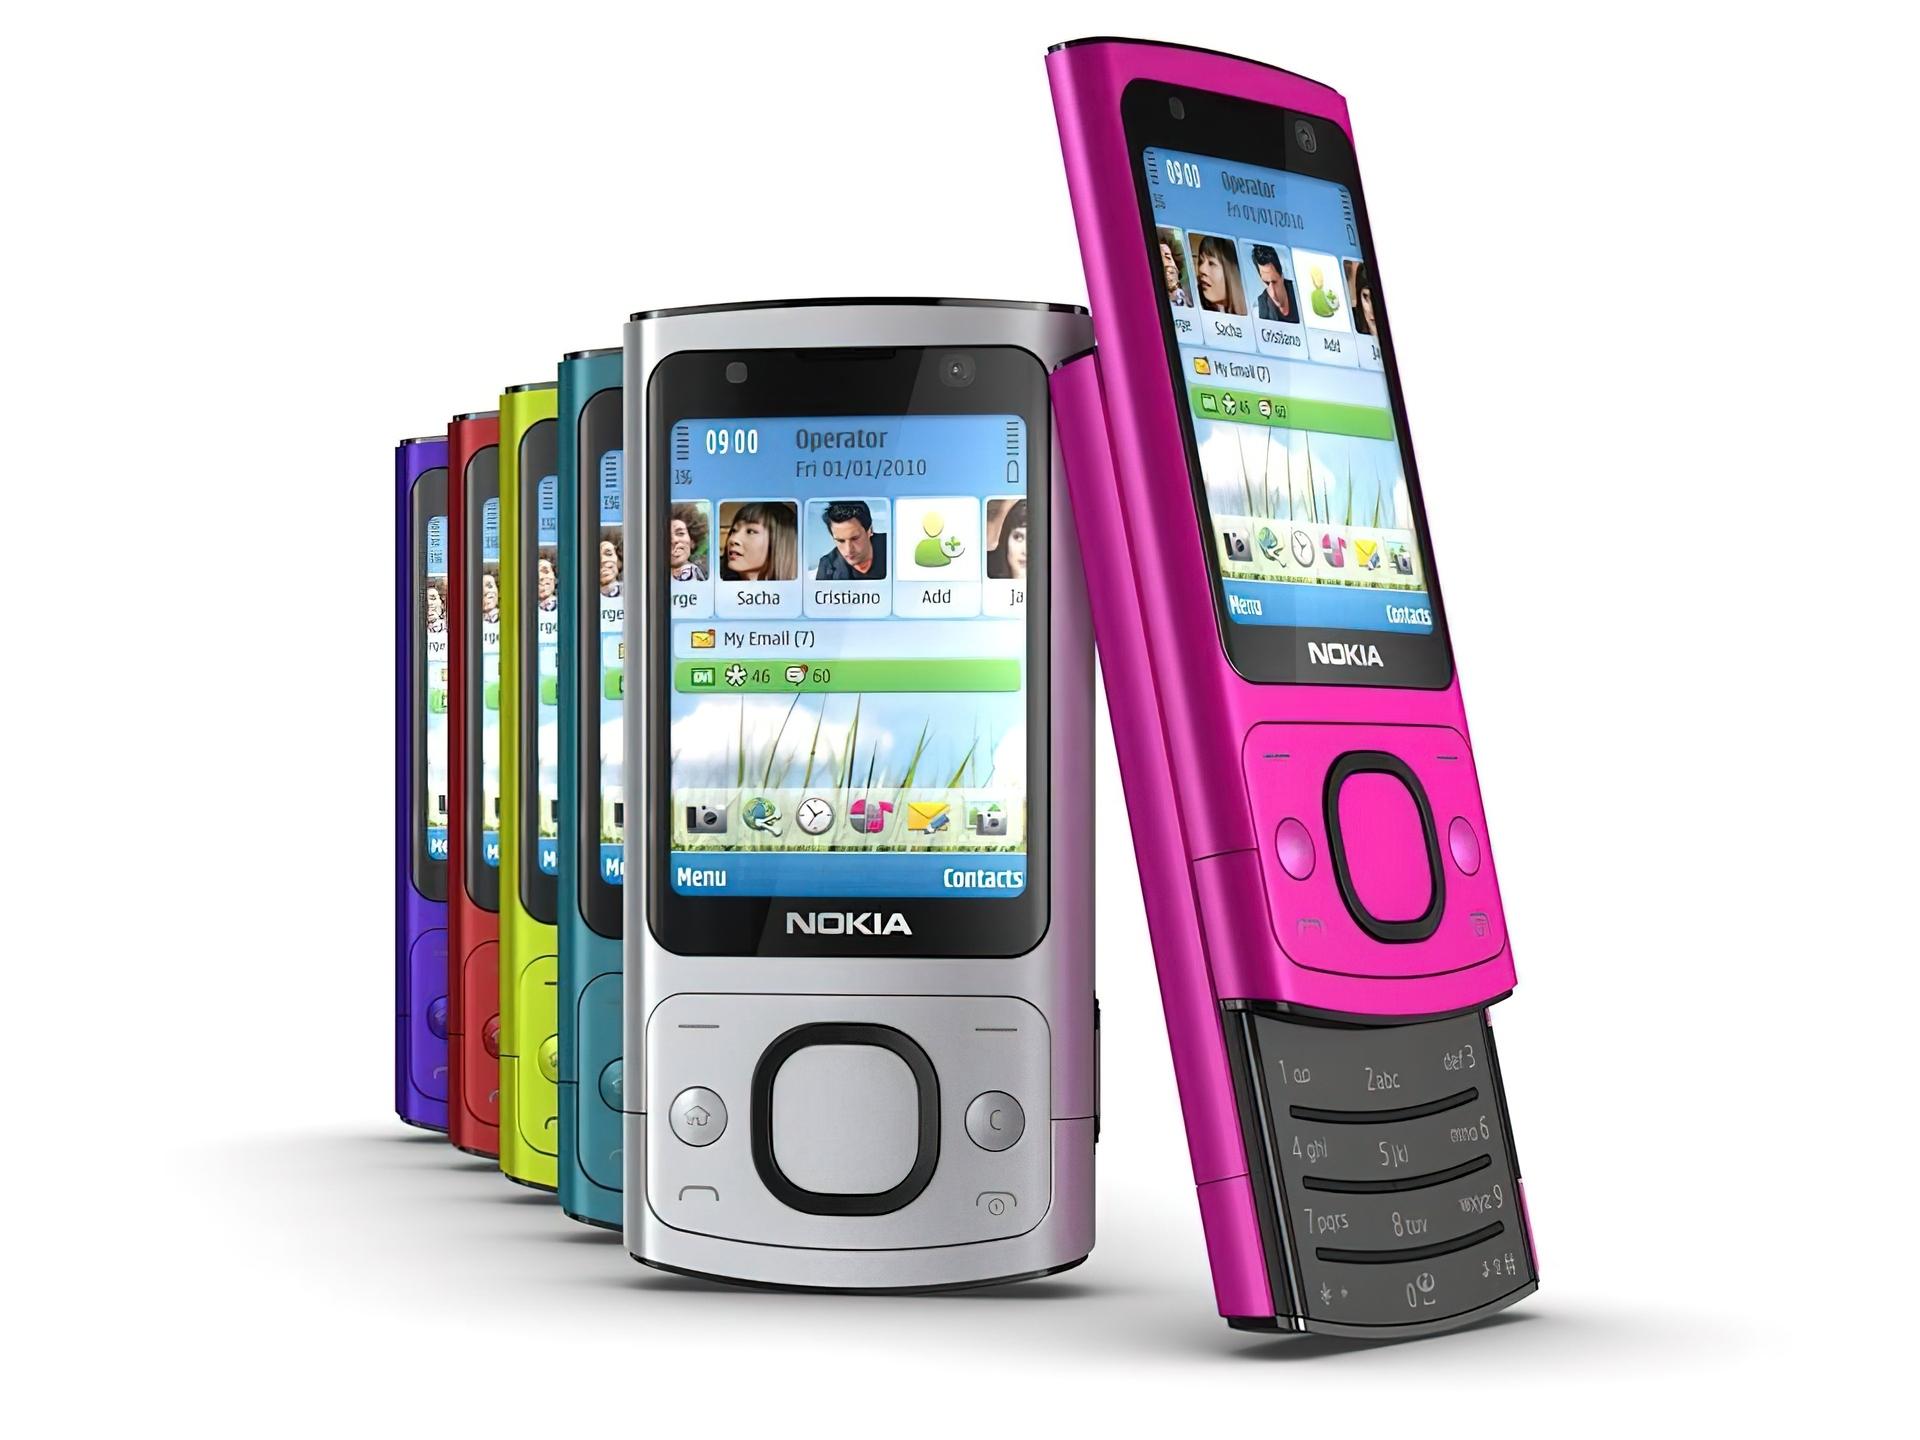 Tapety : Nokia 6700 slide